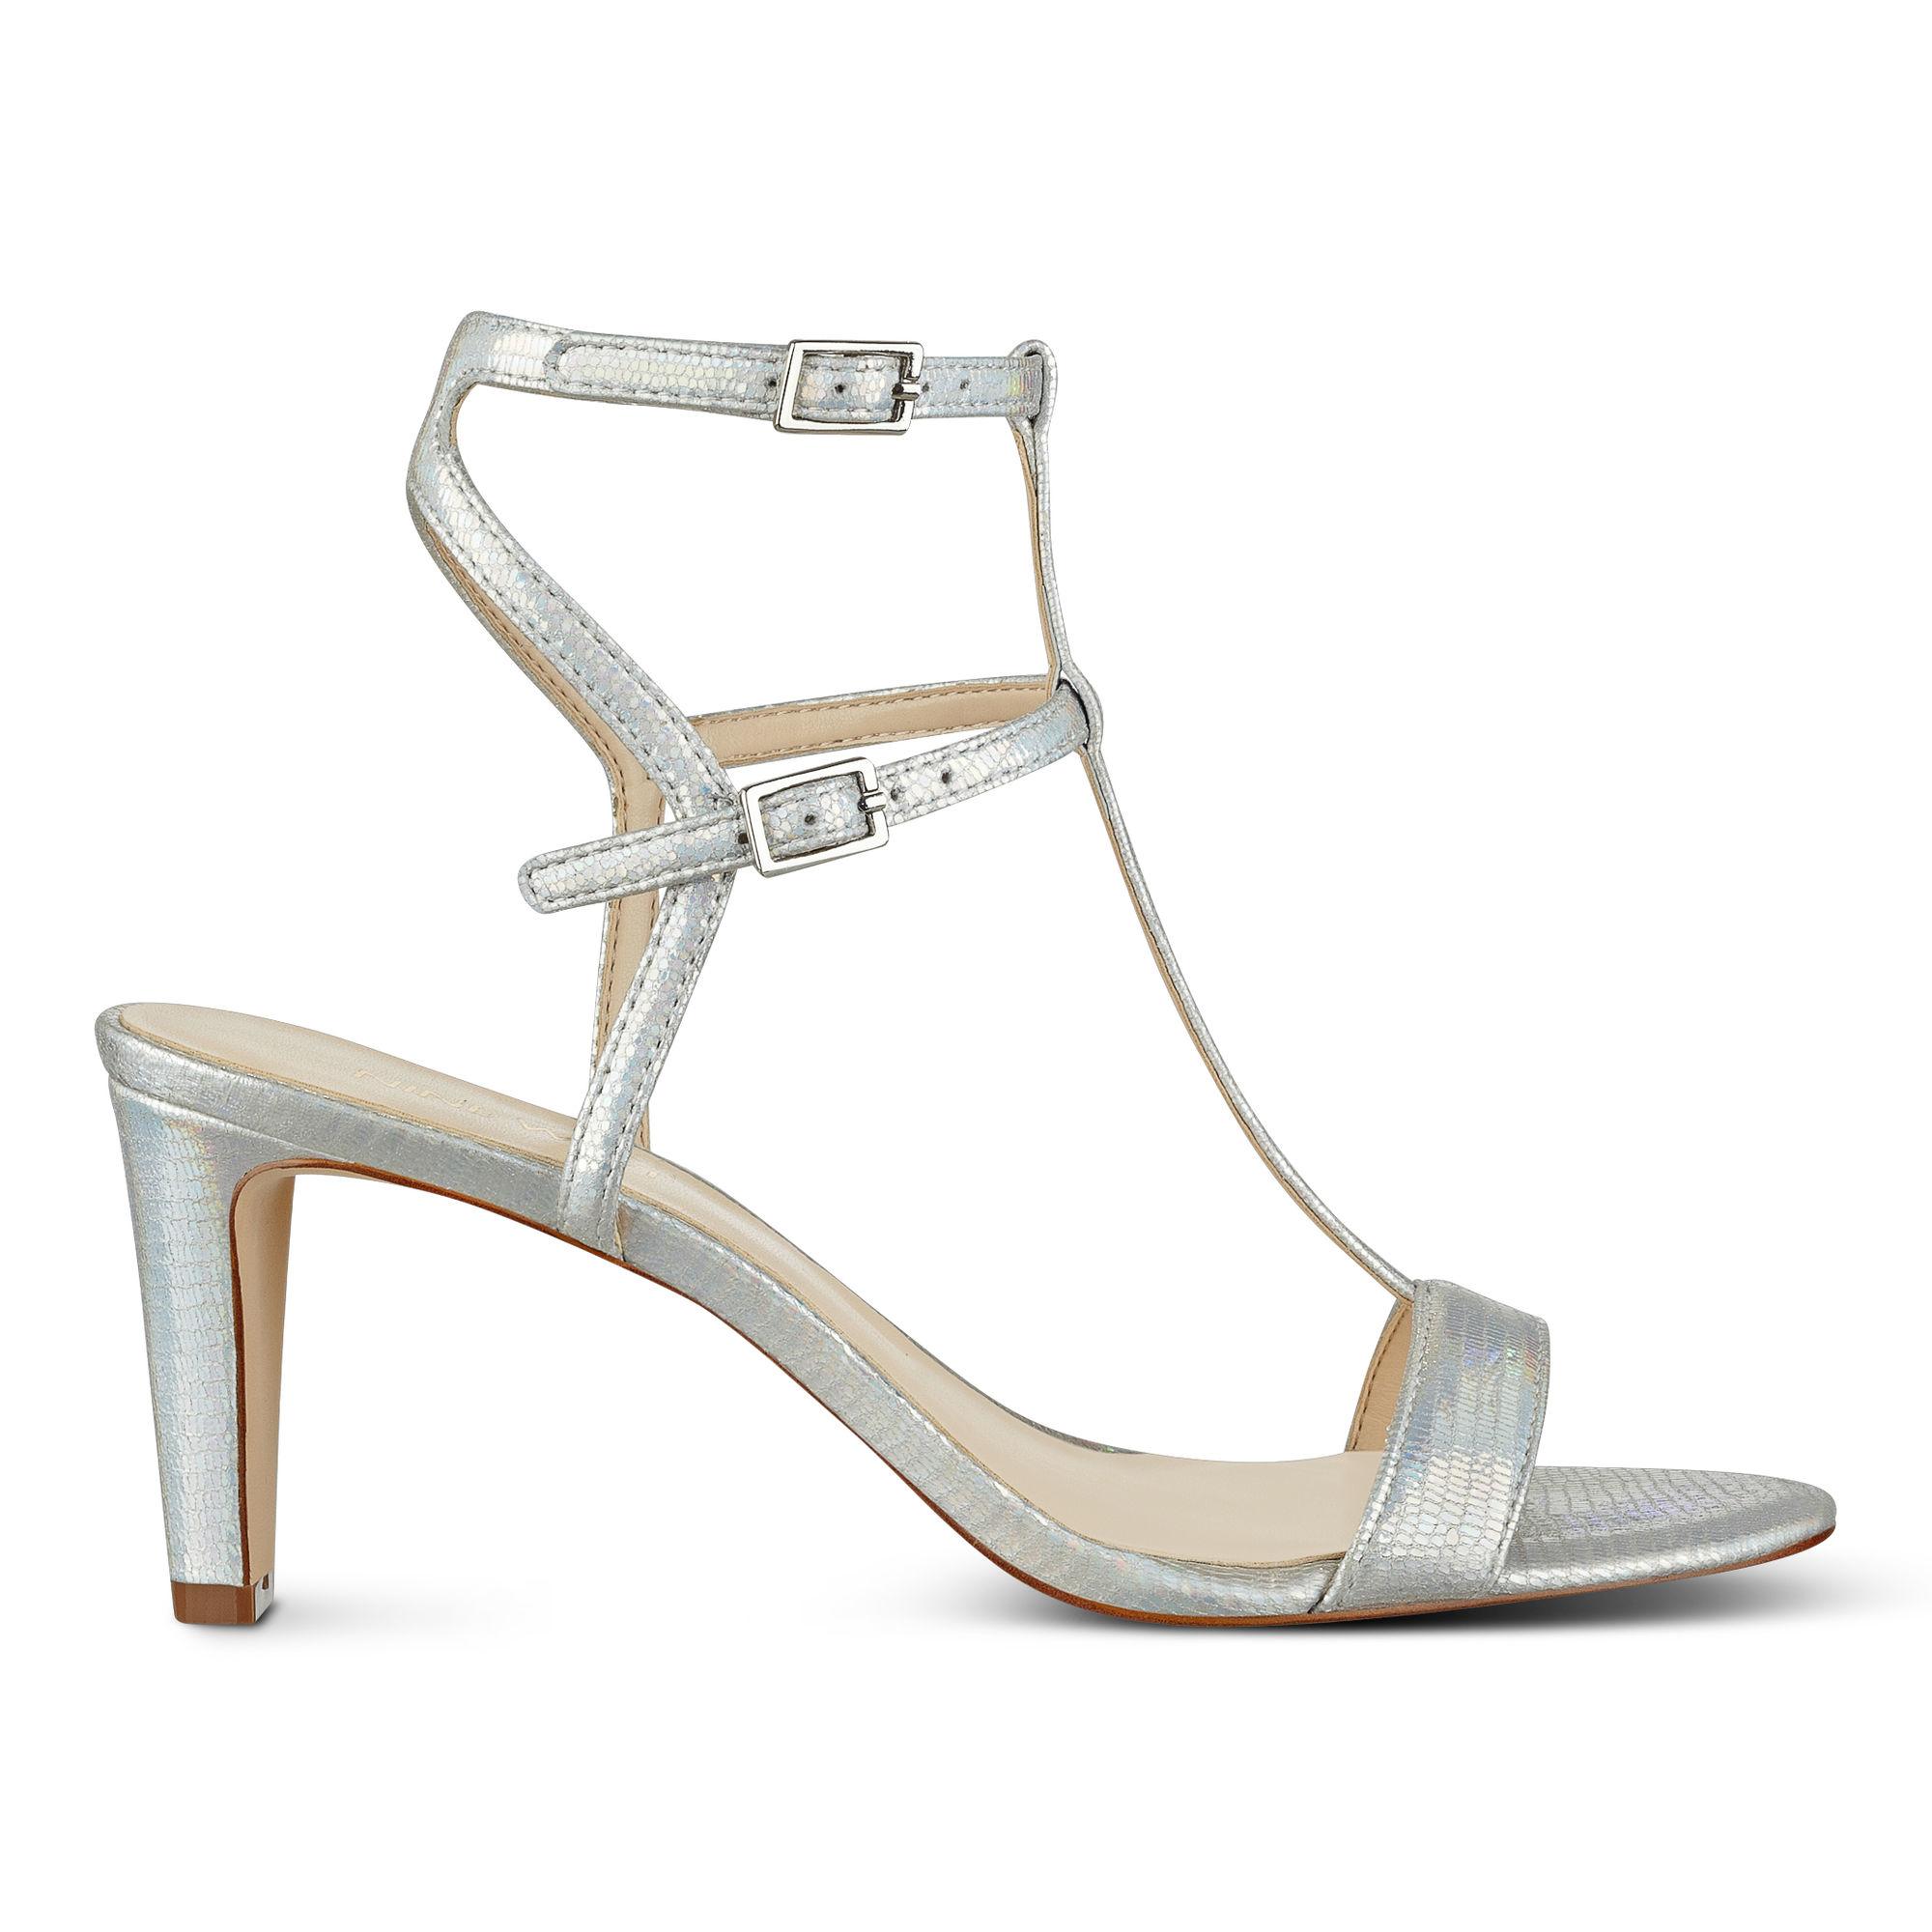 1b4967a23fd Lyst - Nine West Dacey T-strap Sandals in Metallic